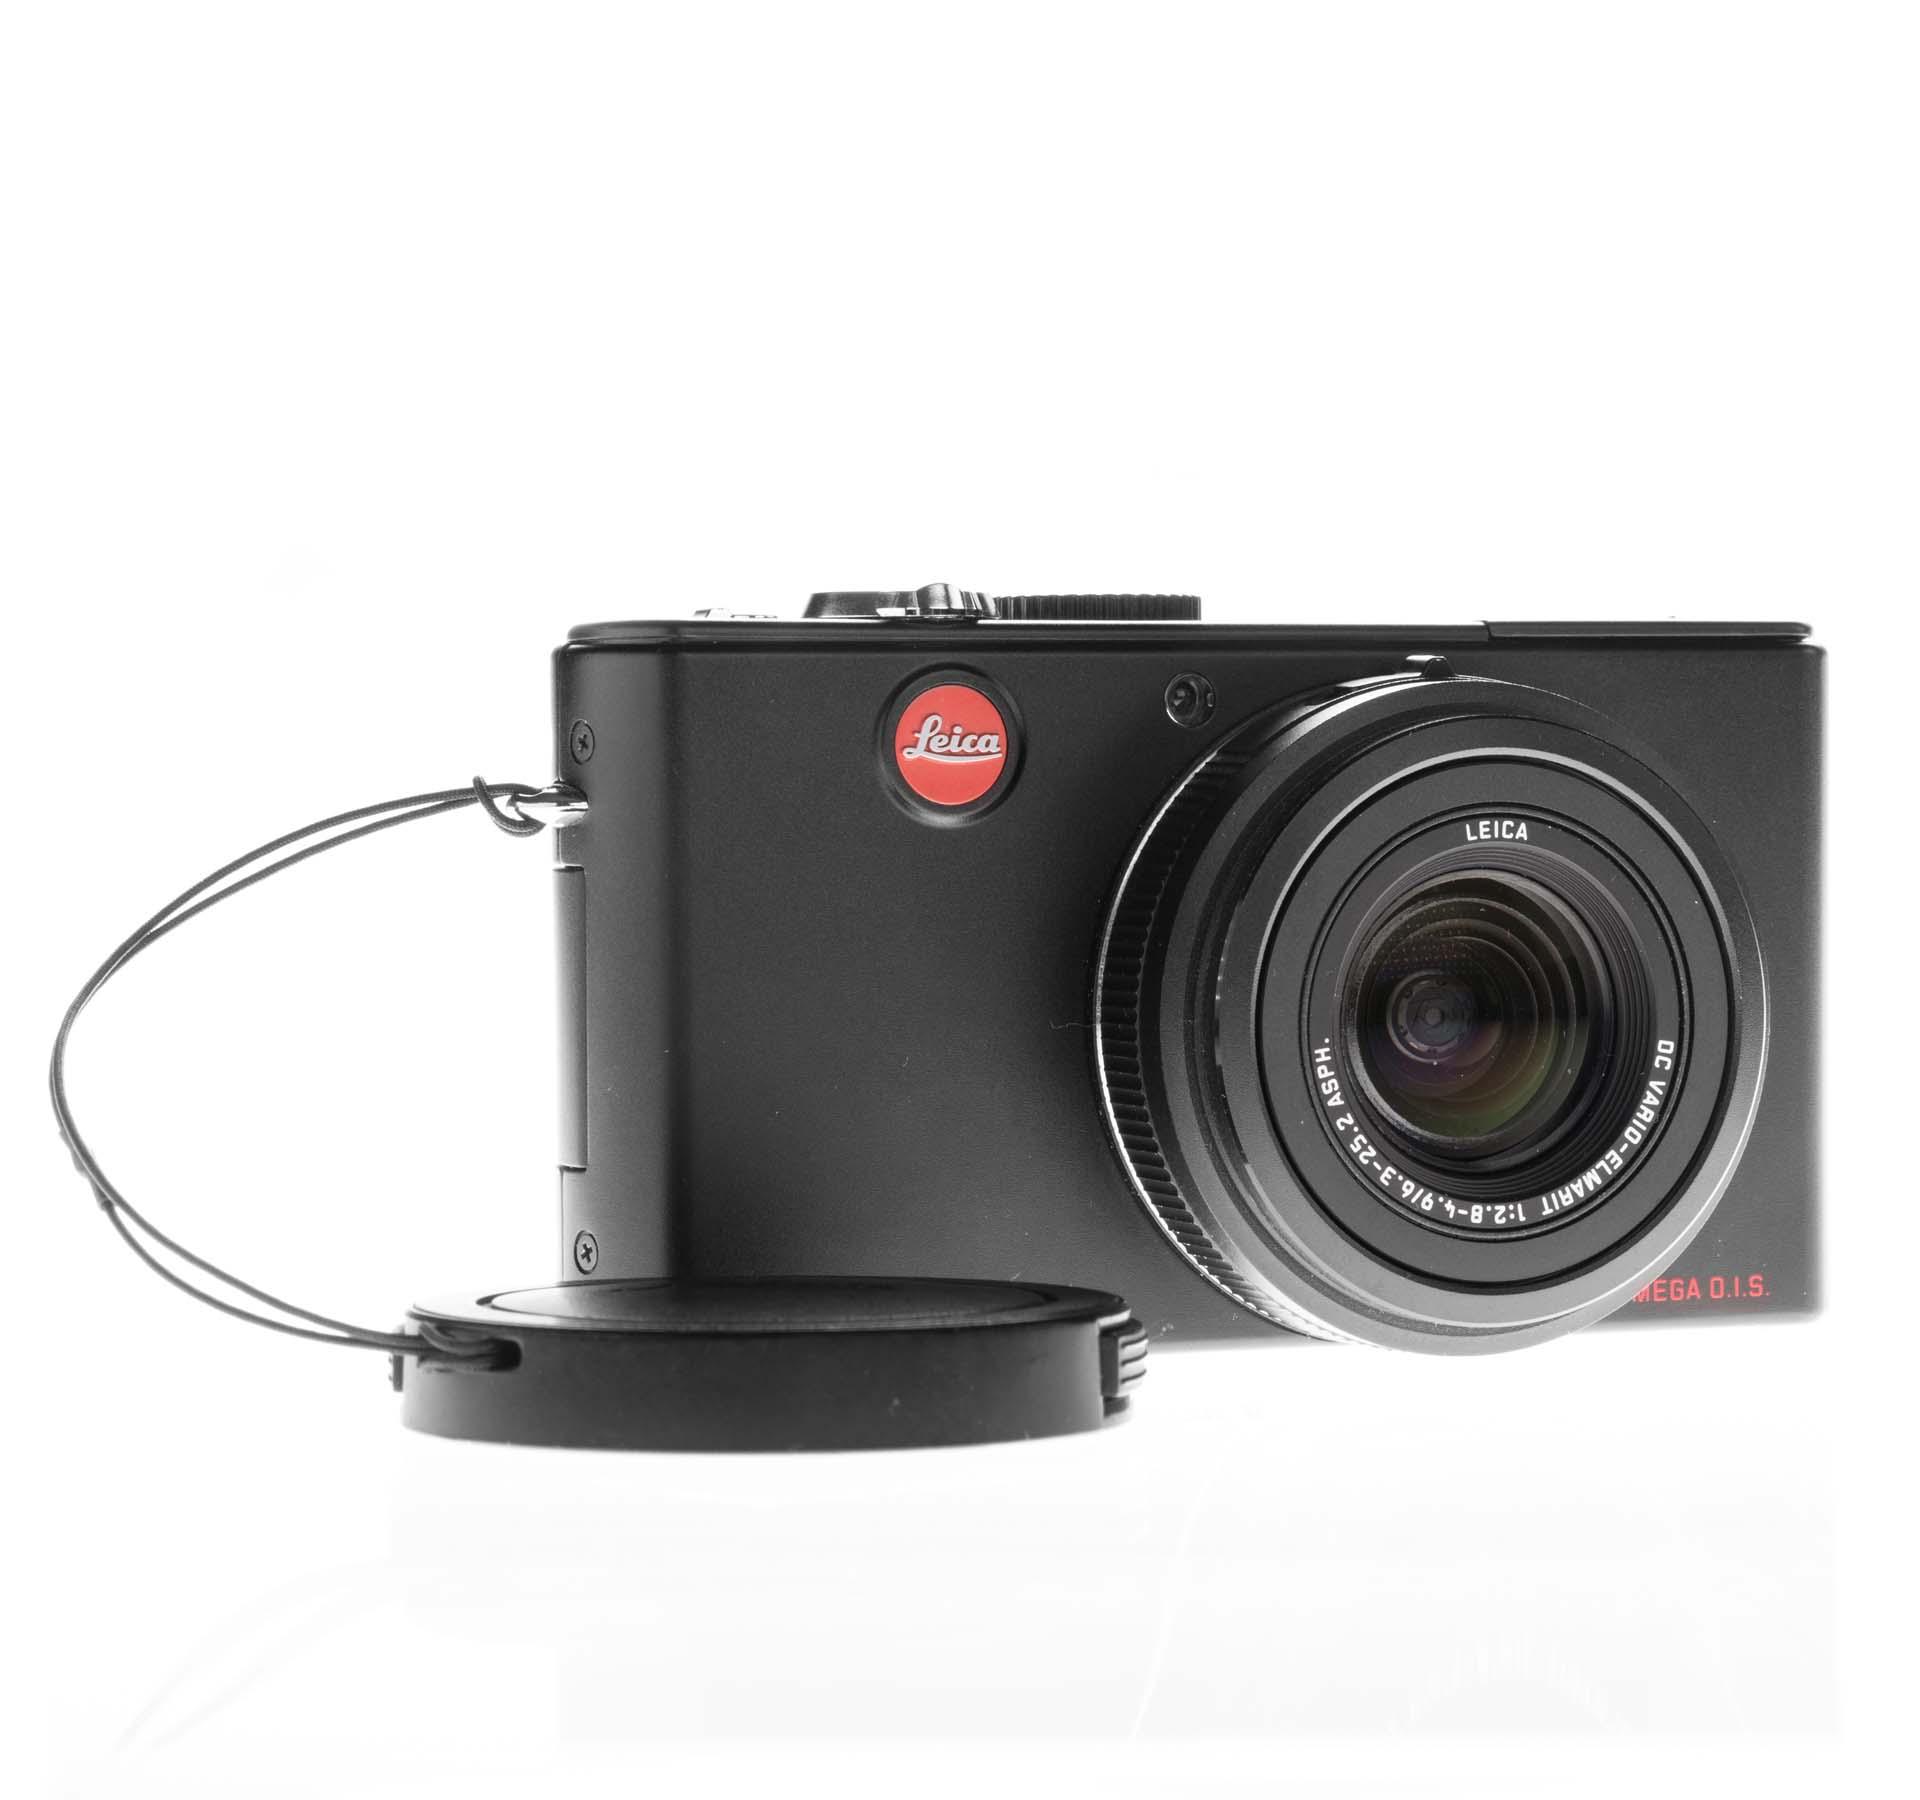 Gelegenheiten Leica D-LUX3